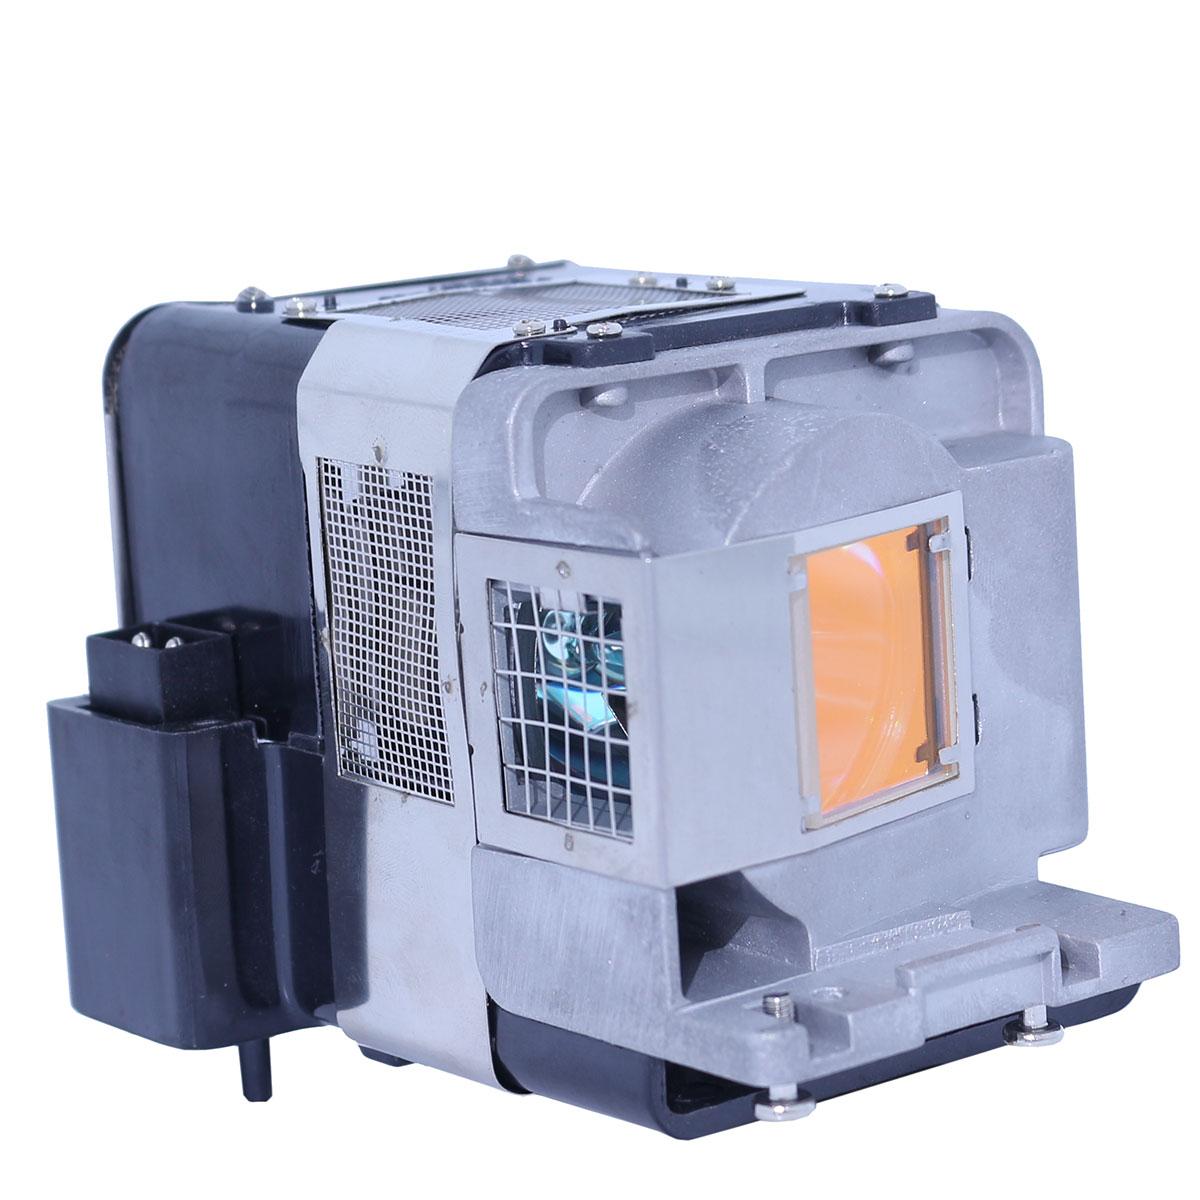 projector lamps components see more mitsubishi vlt hc3800lp lamp. Black Bedroom Furniture Sets. Home Design Ideas